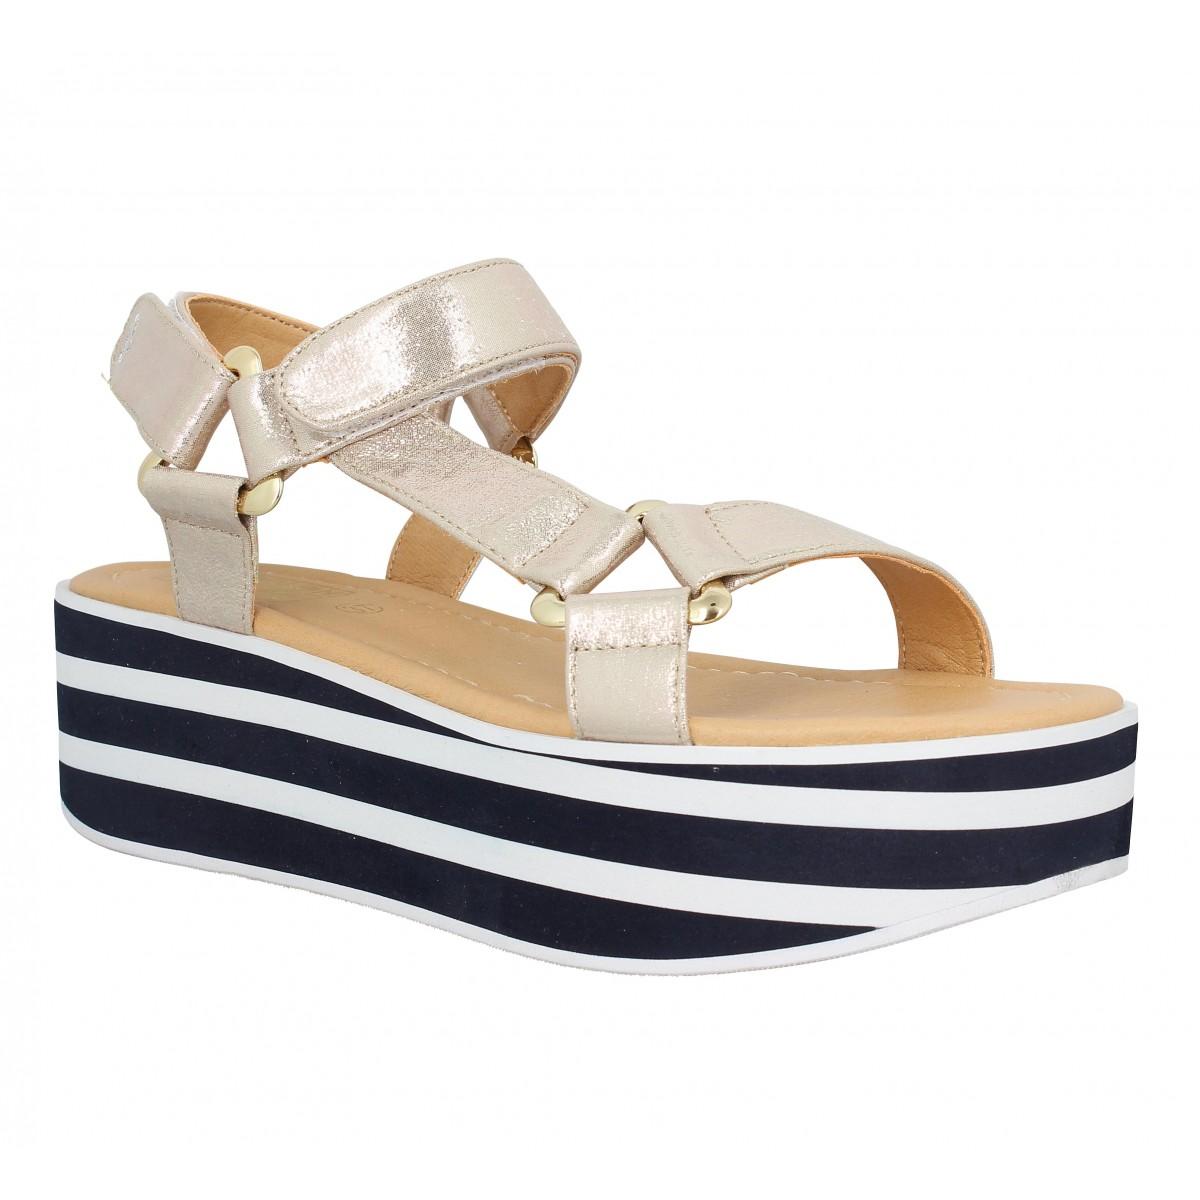 Nu-pieds NO NAME Bahama Sandal Femme Gold